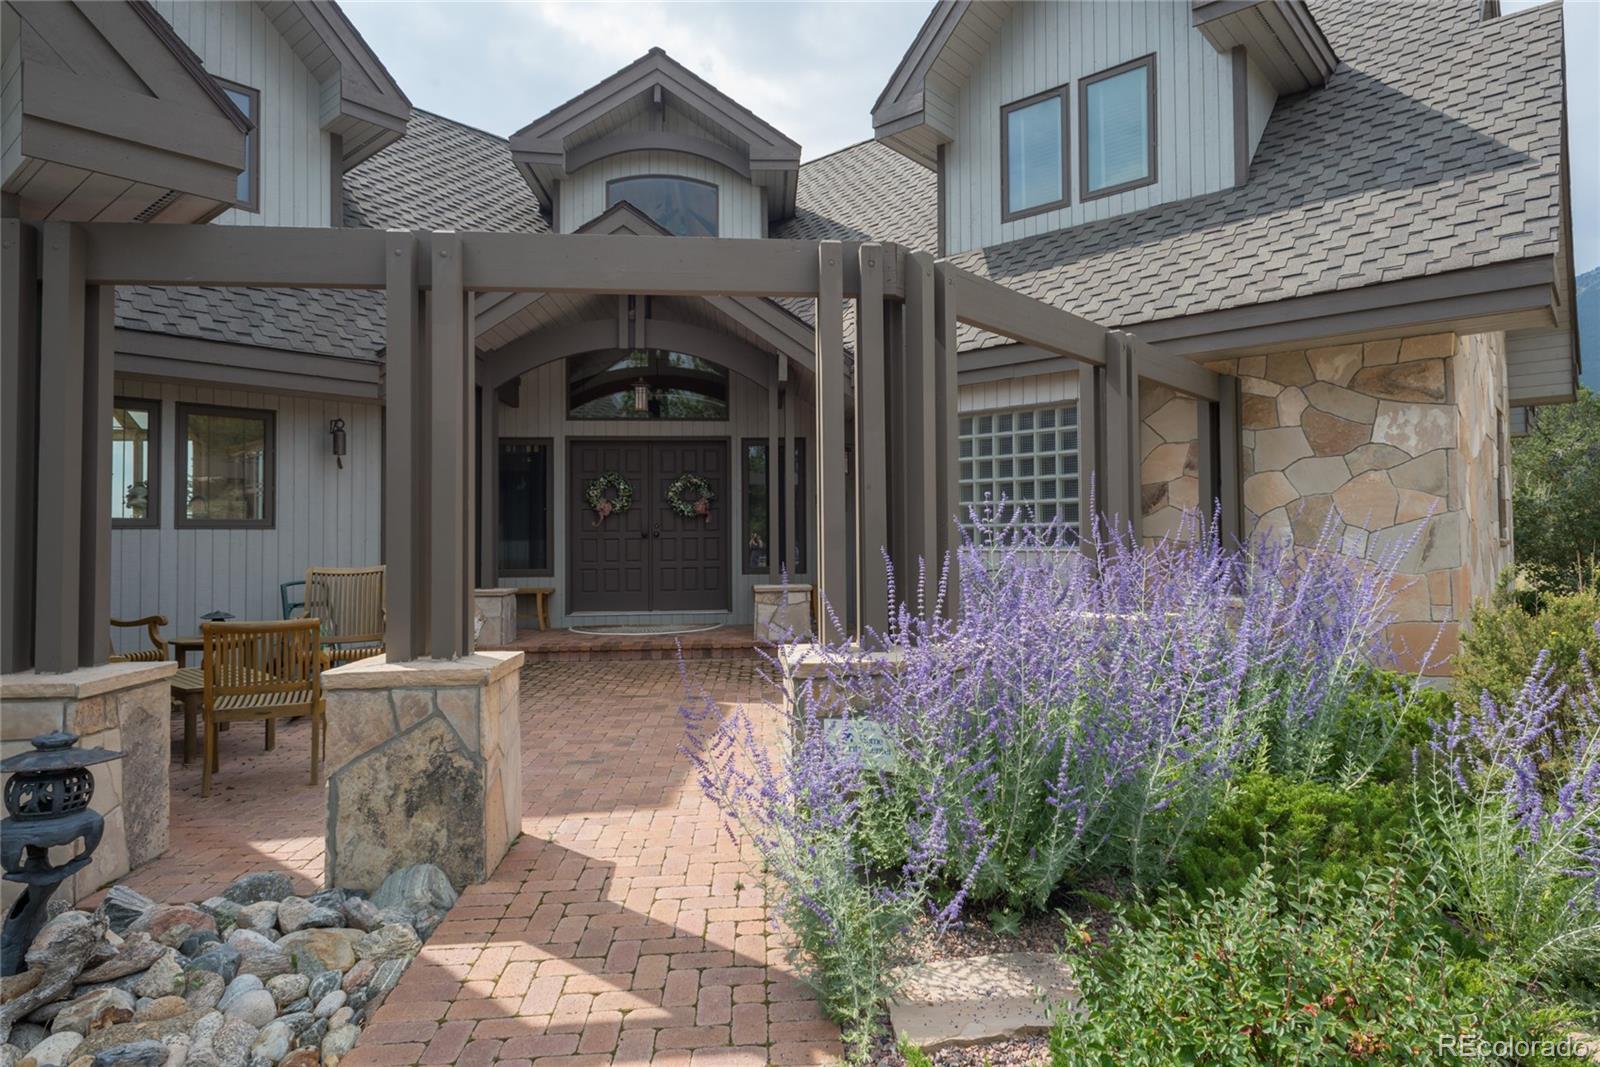 30161 Trails End Property Photo - Buena Vista, CO real estate listing